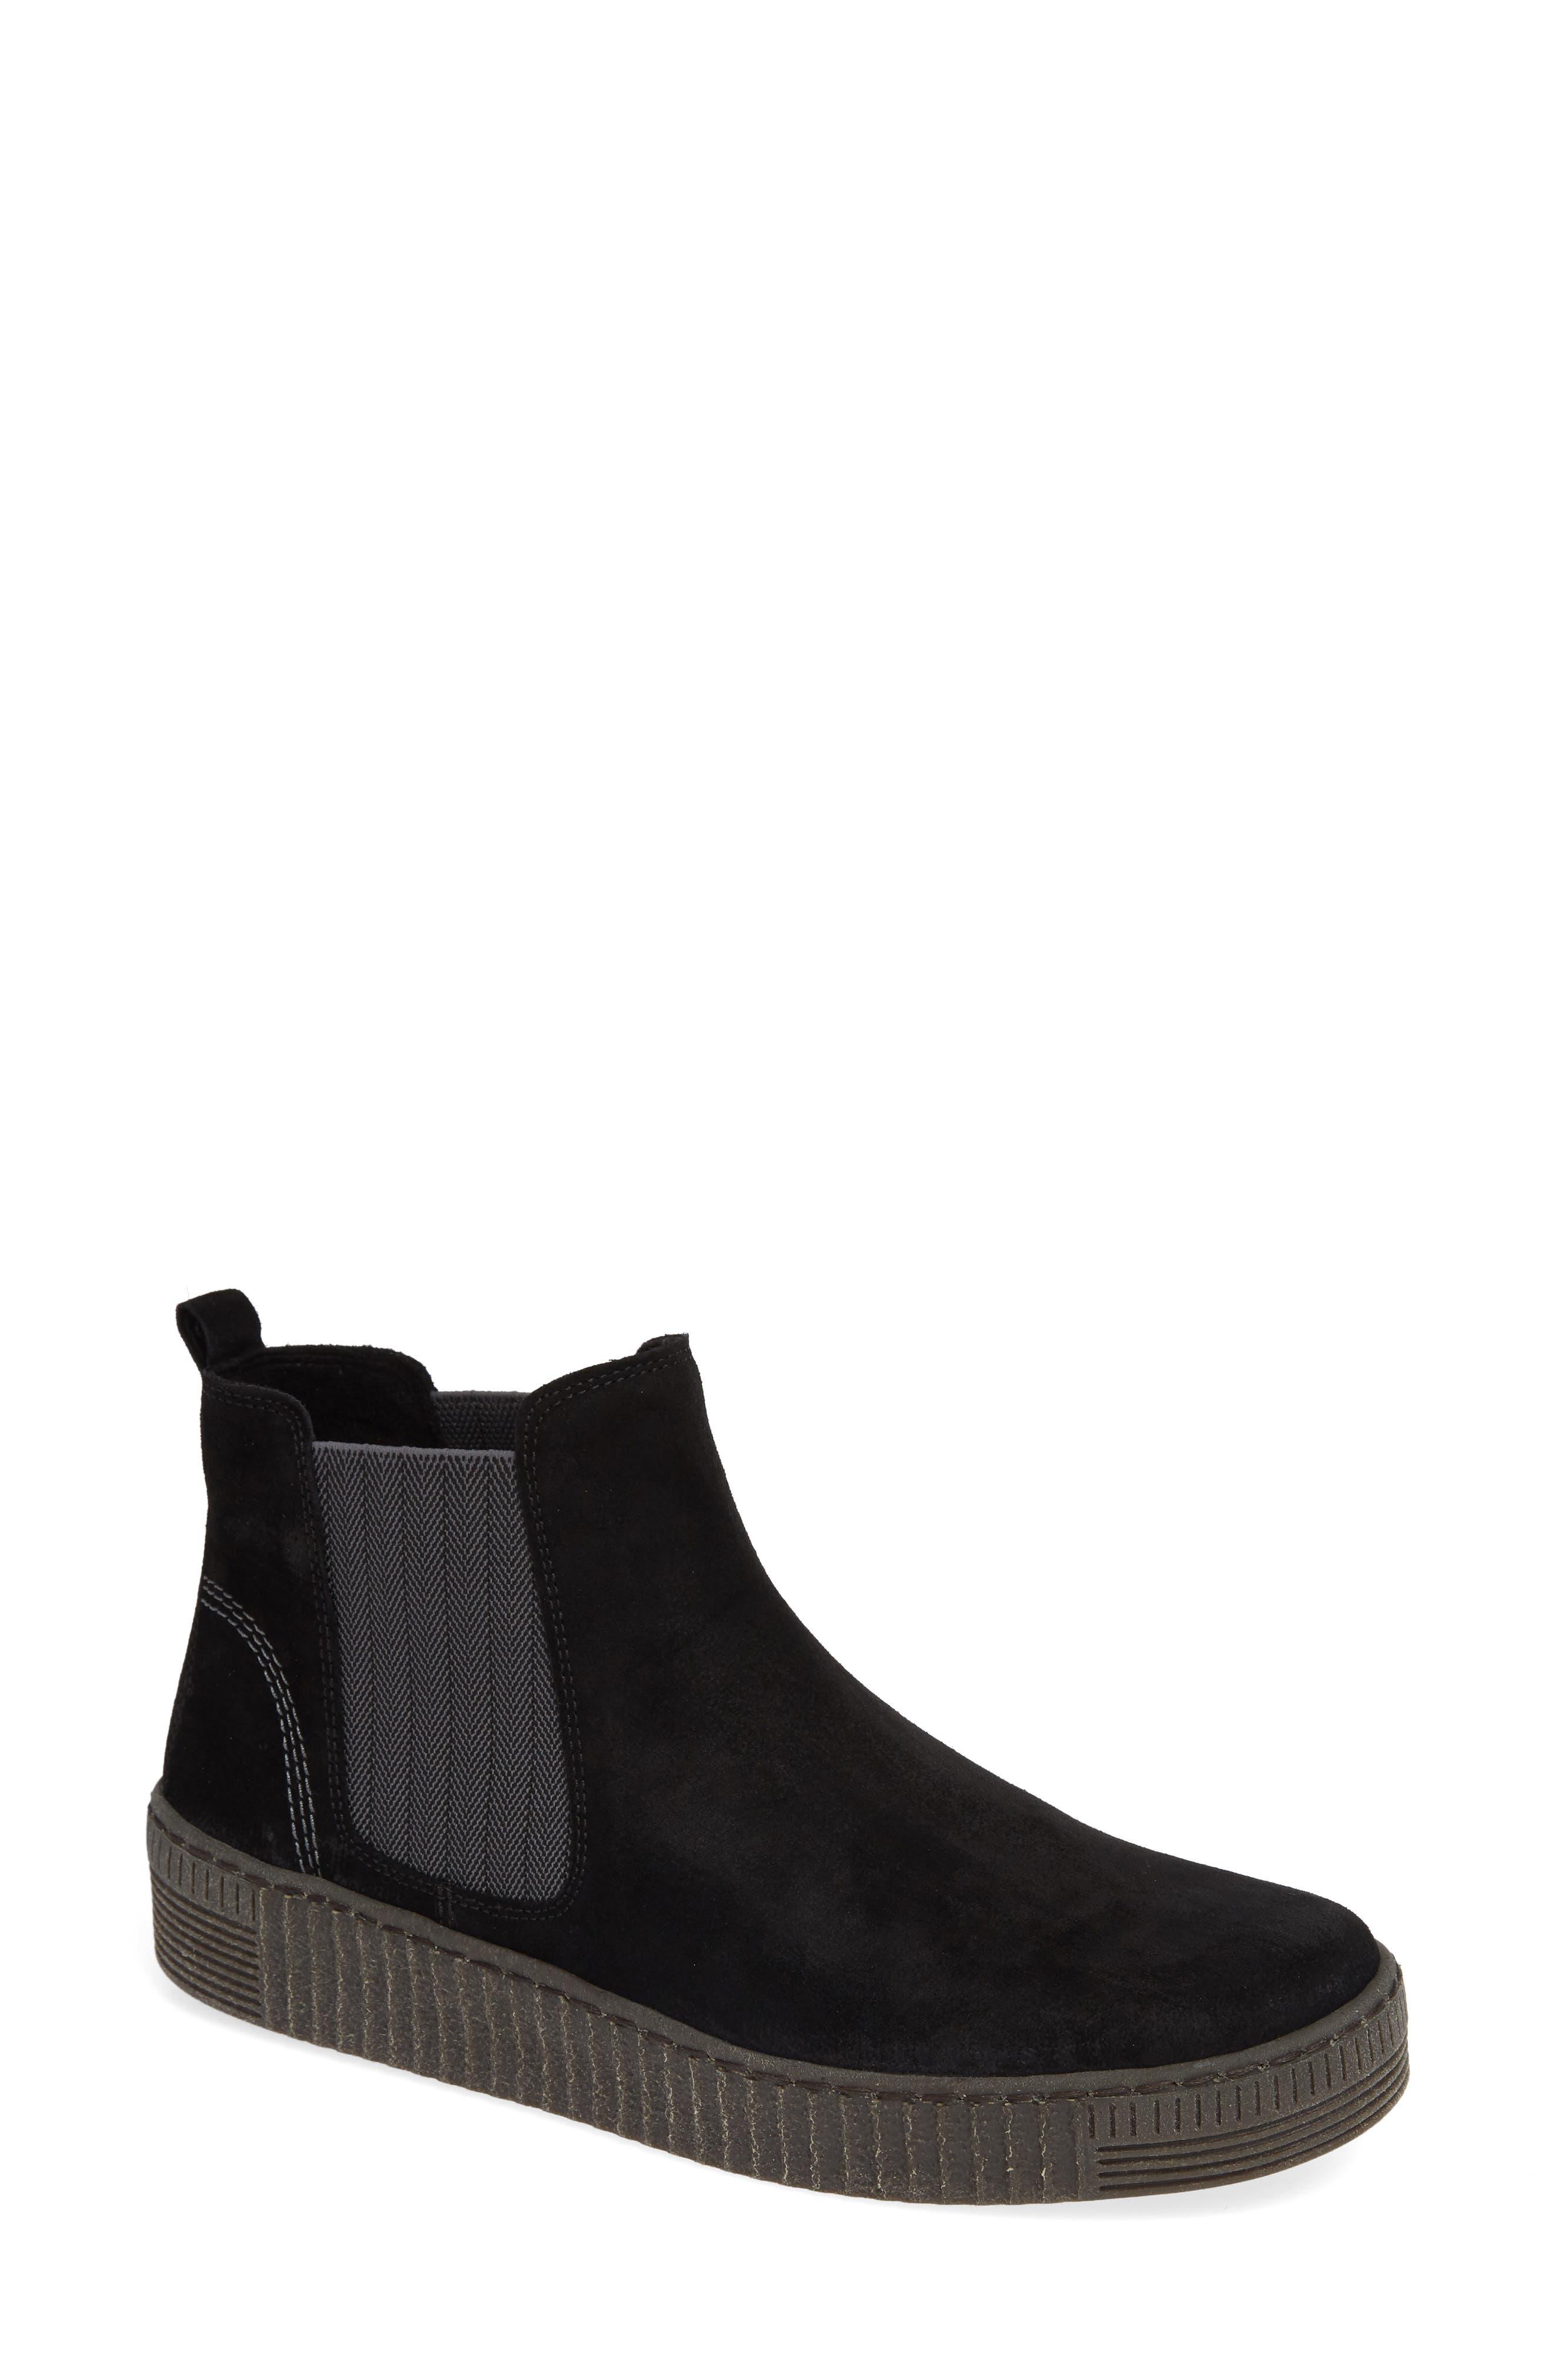 Women's Gabor Shoes Sale \u0026 Clearance